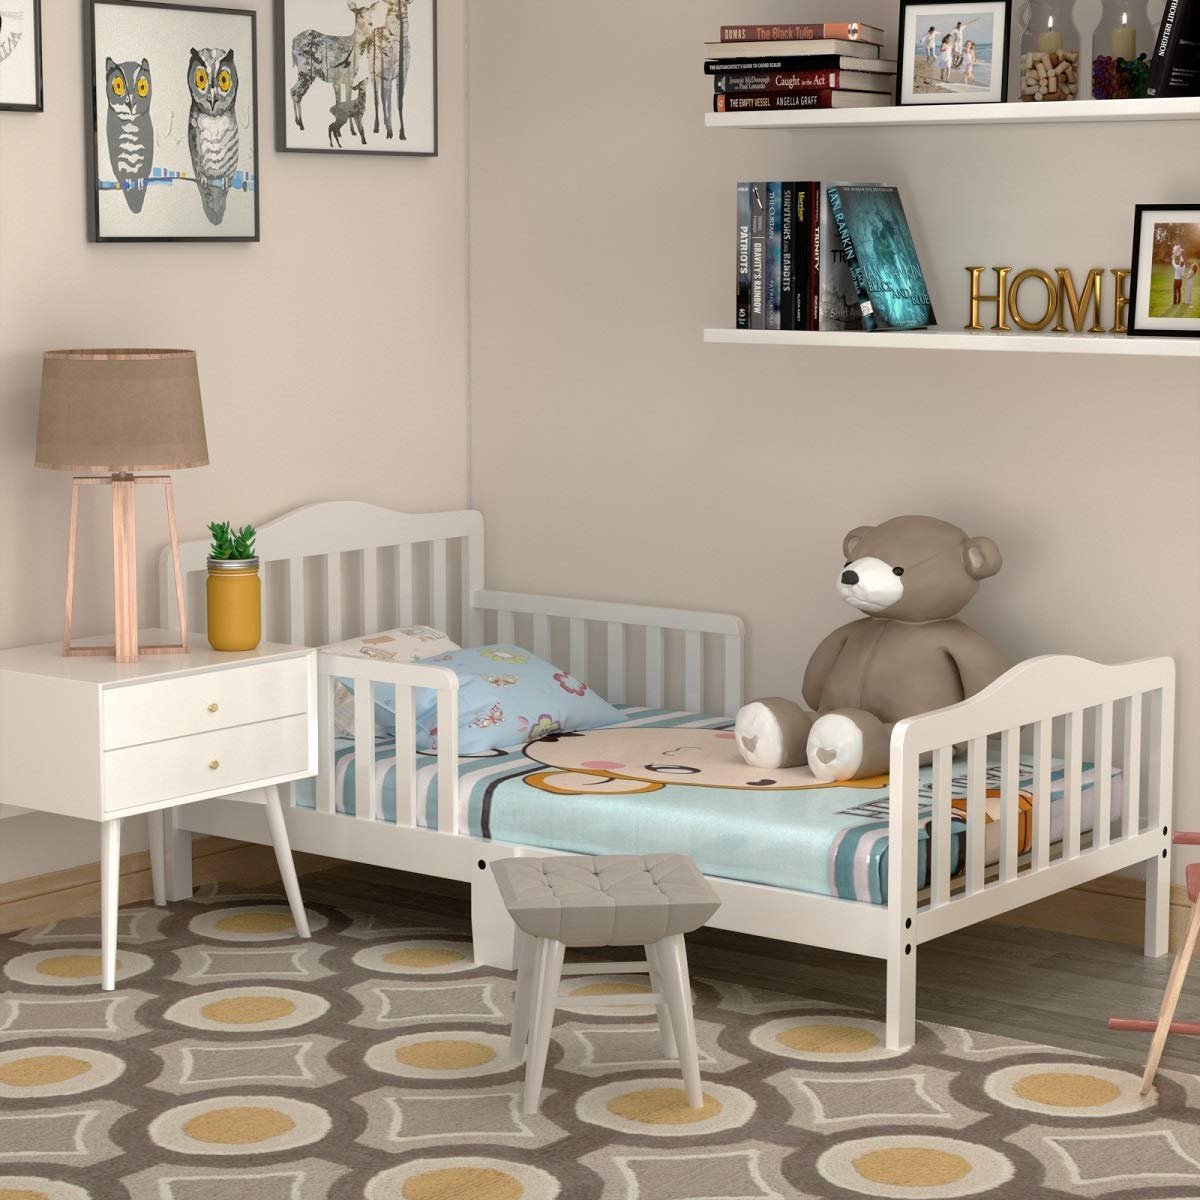 Classic Kids Children Toddler Wood Bed Bedroom Furniture w// Guardrails Black